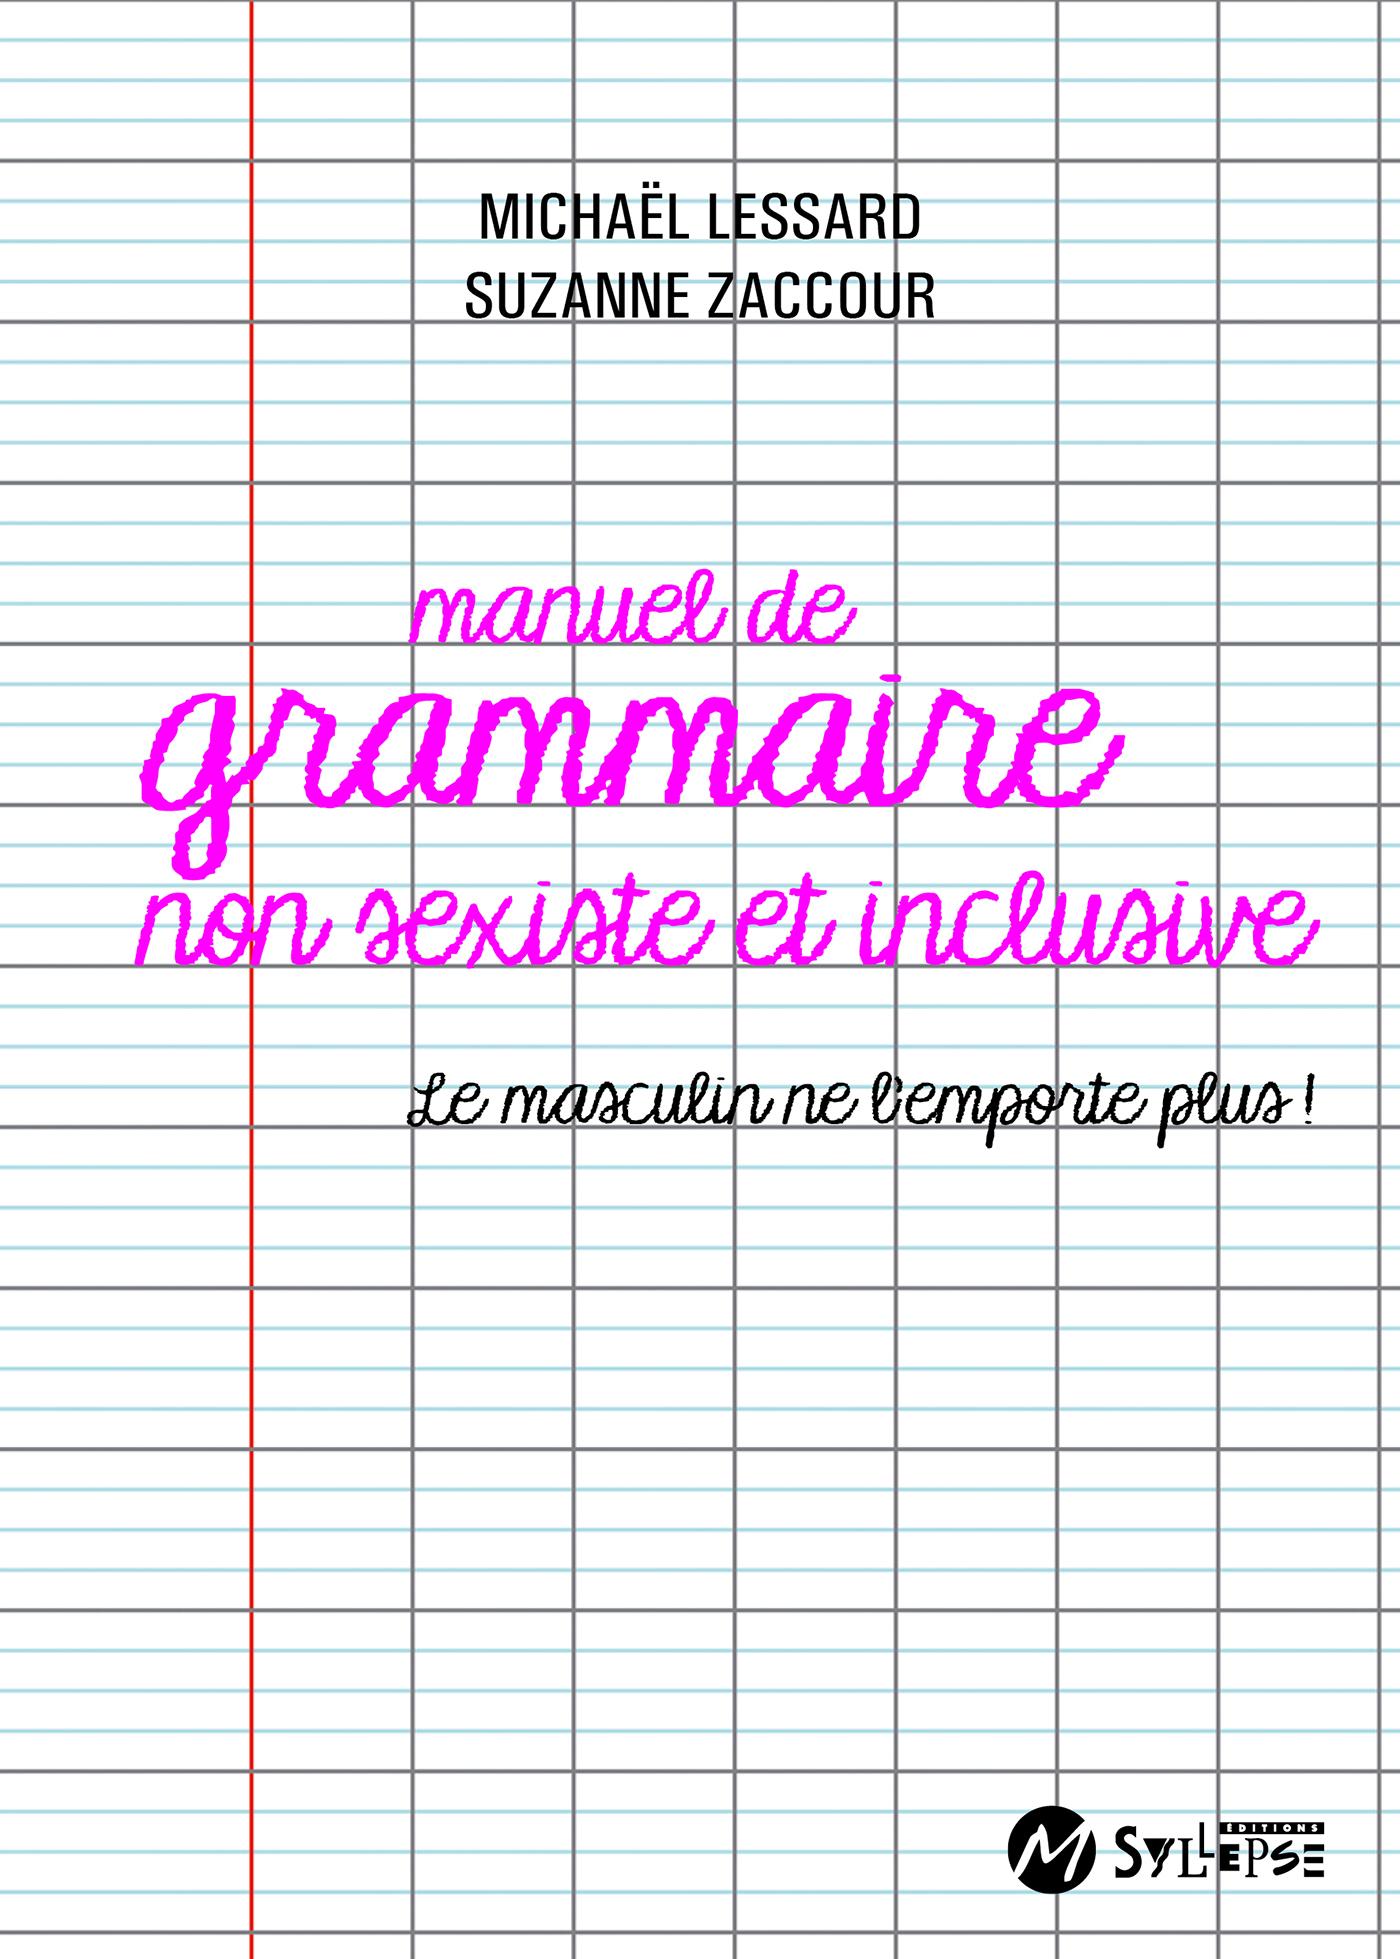 MANUEL DE GRAMMAIRE NON SEXISTE